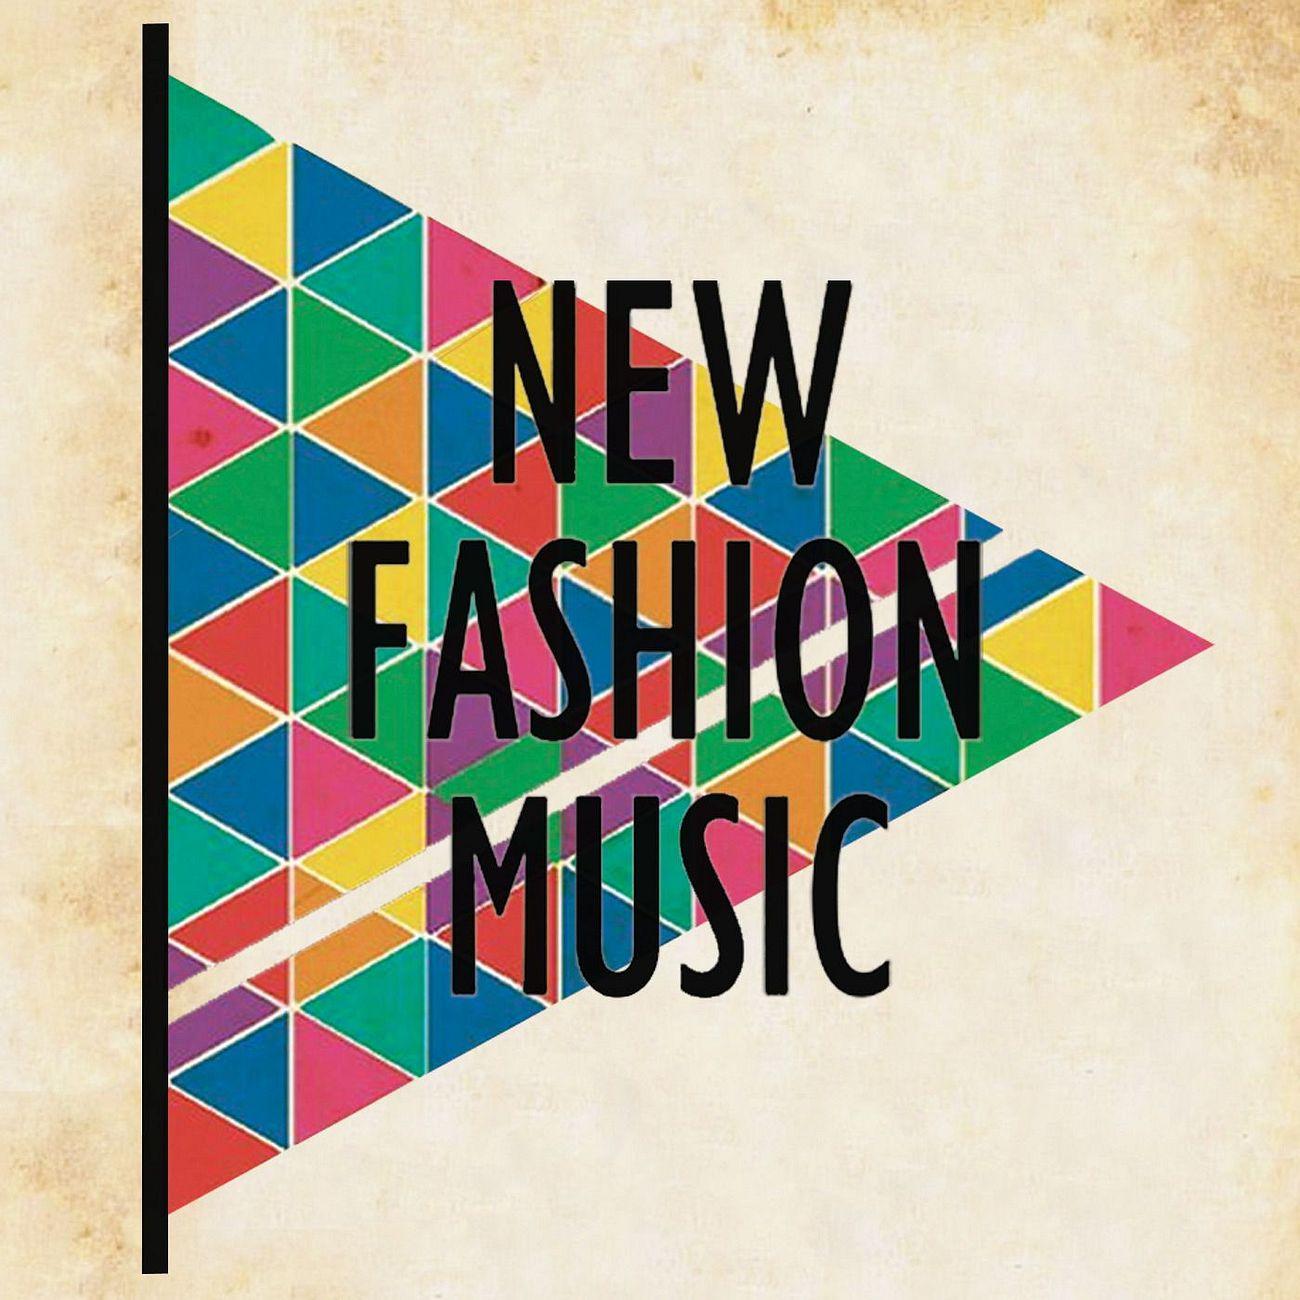 NewFashion Music